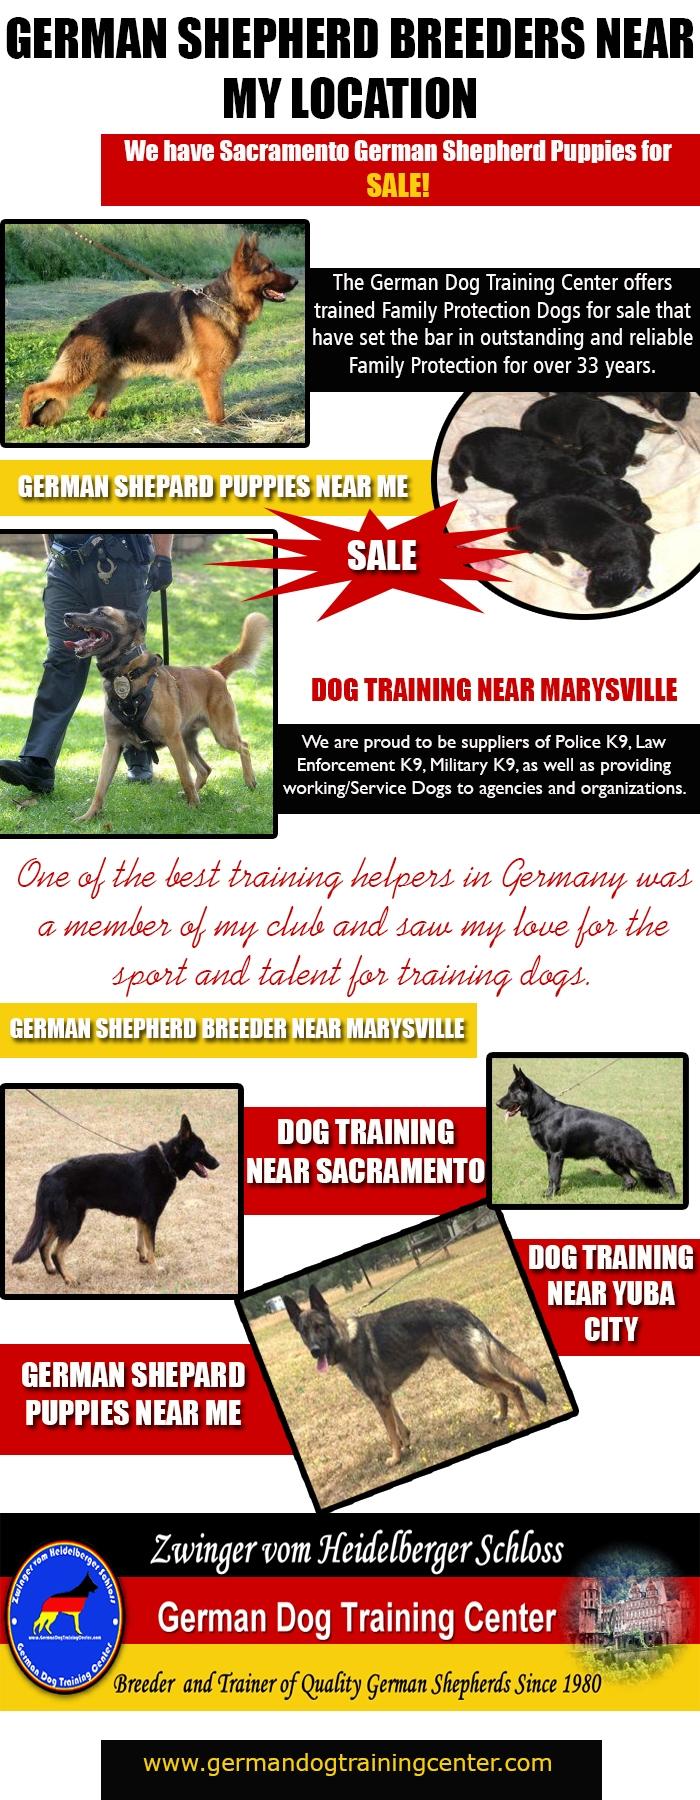 German Shepherd Breeders Locati - marysvilledogtraining | ello